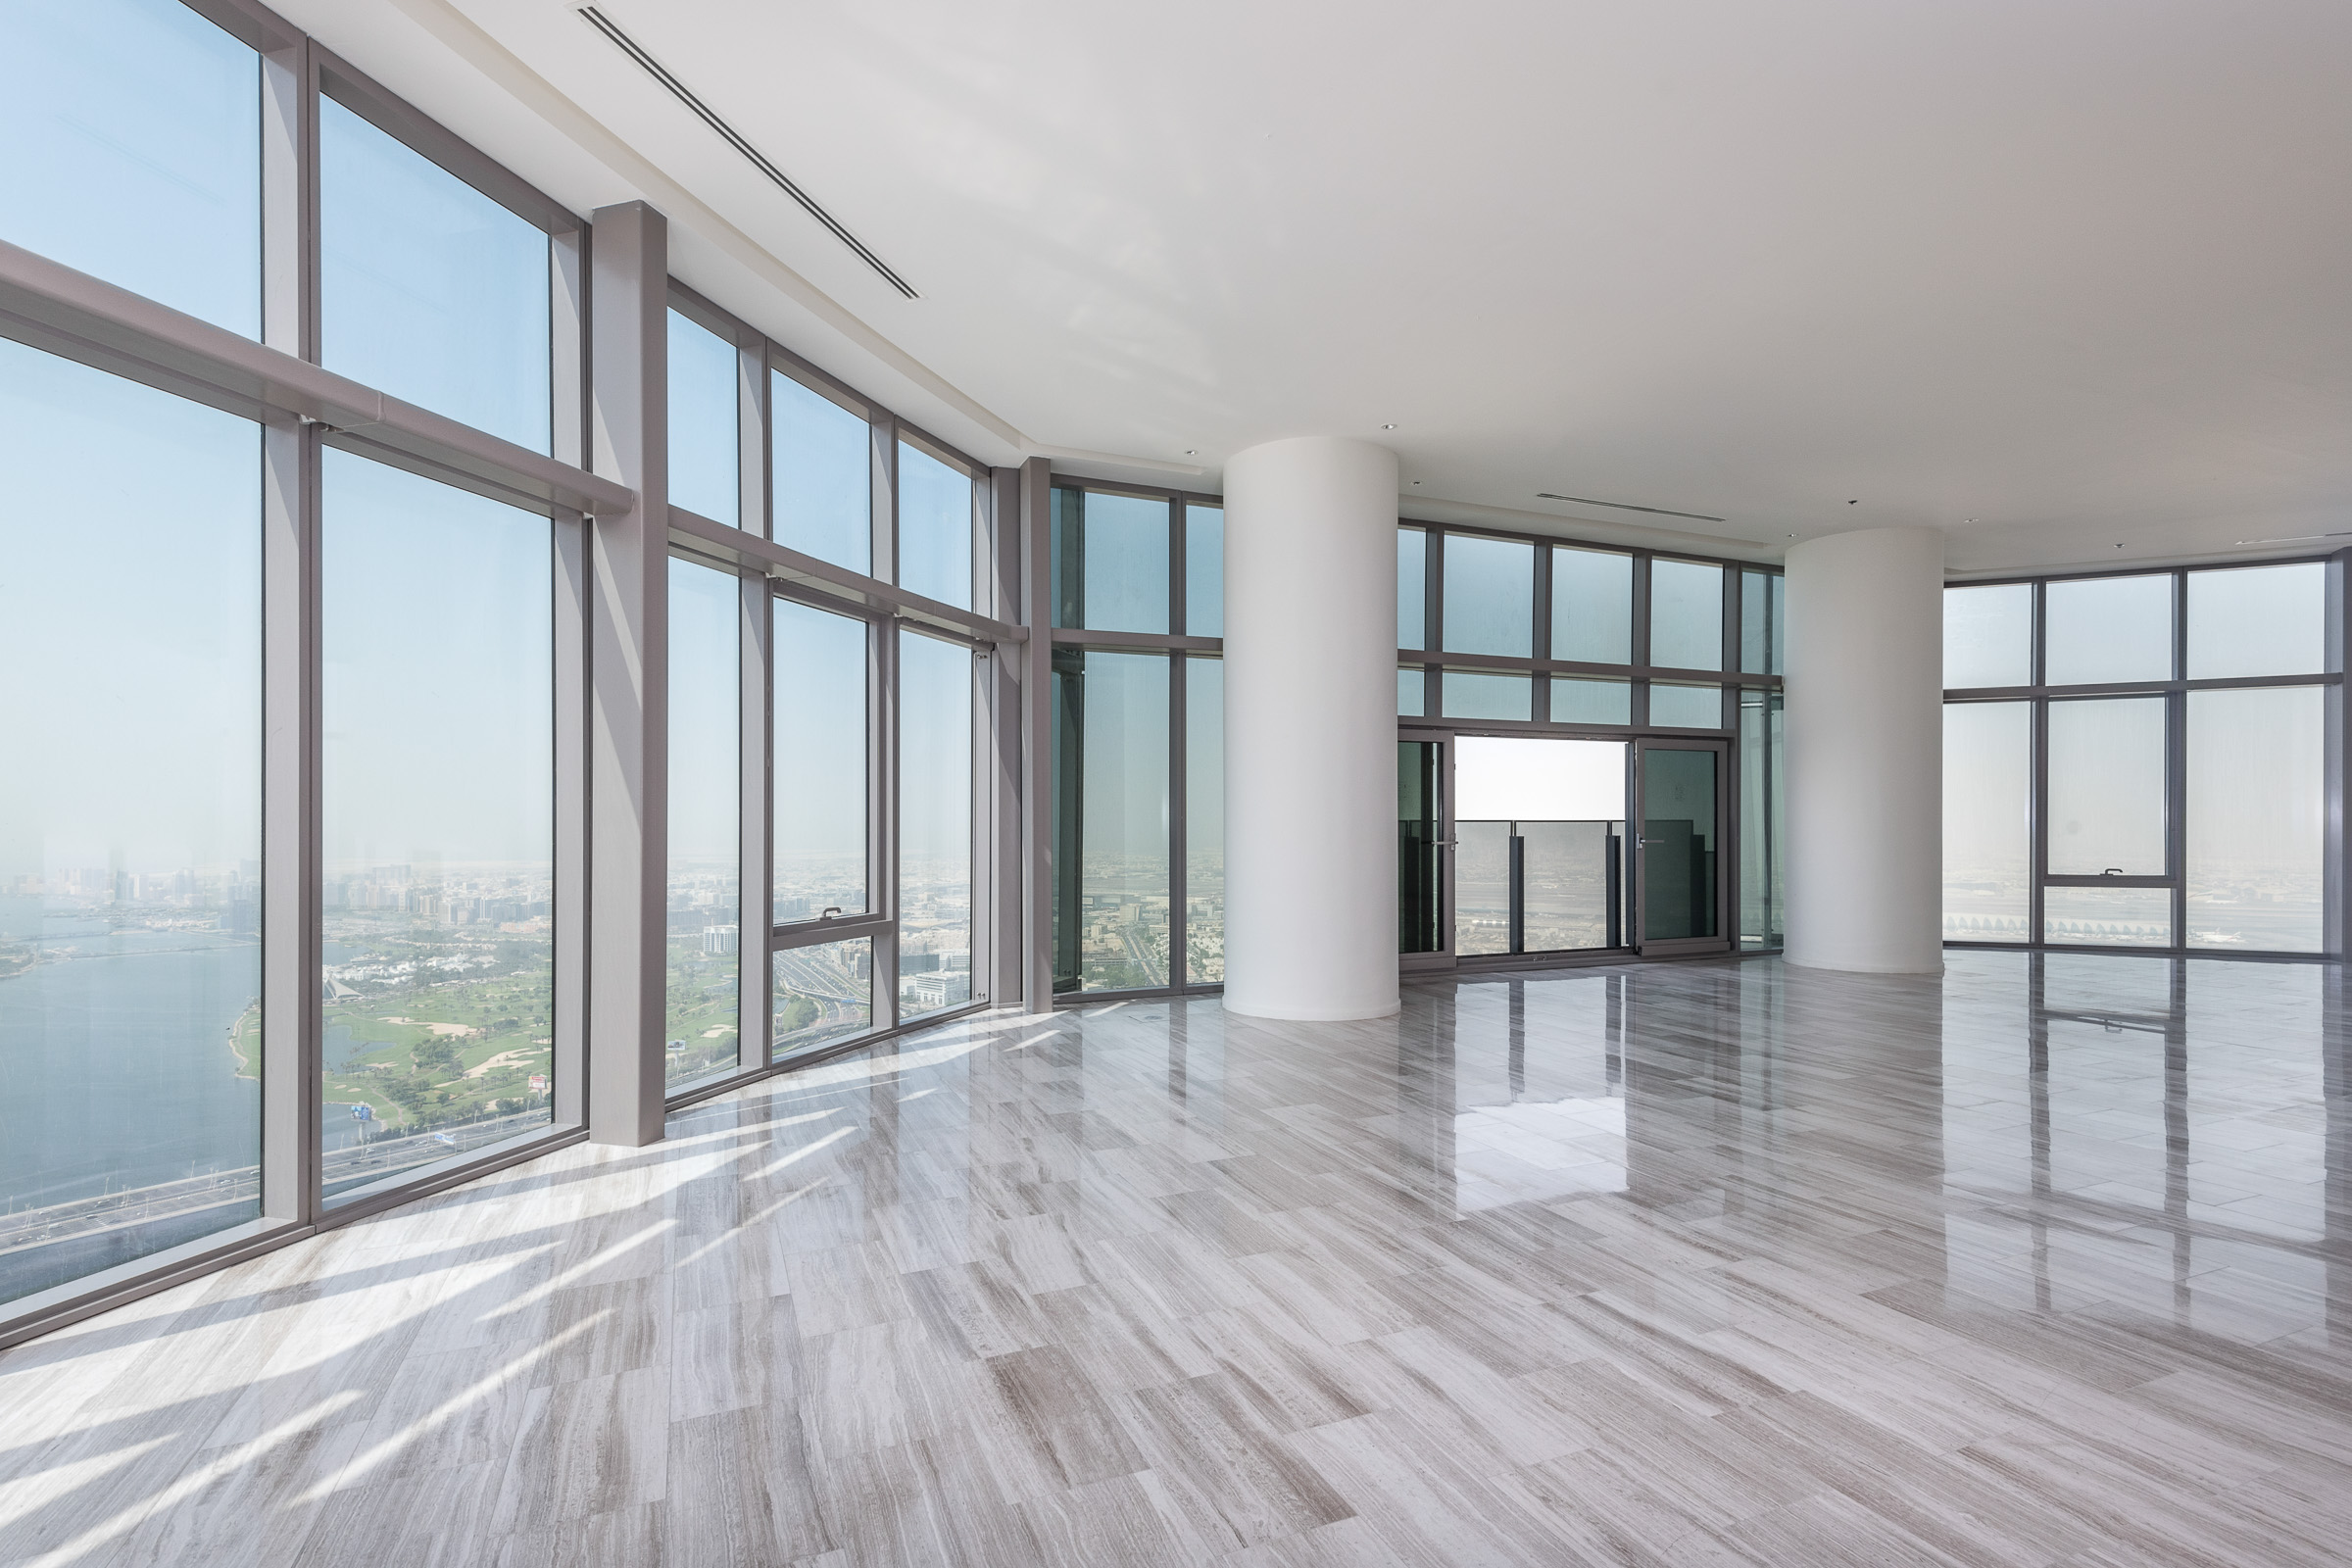 Apartment for Sale at Contemporary Penthouse - D1 Culture Village, Dubai, United Arab Emirates